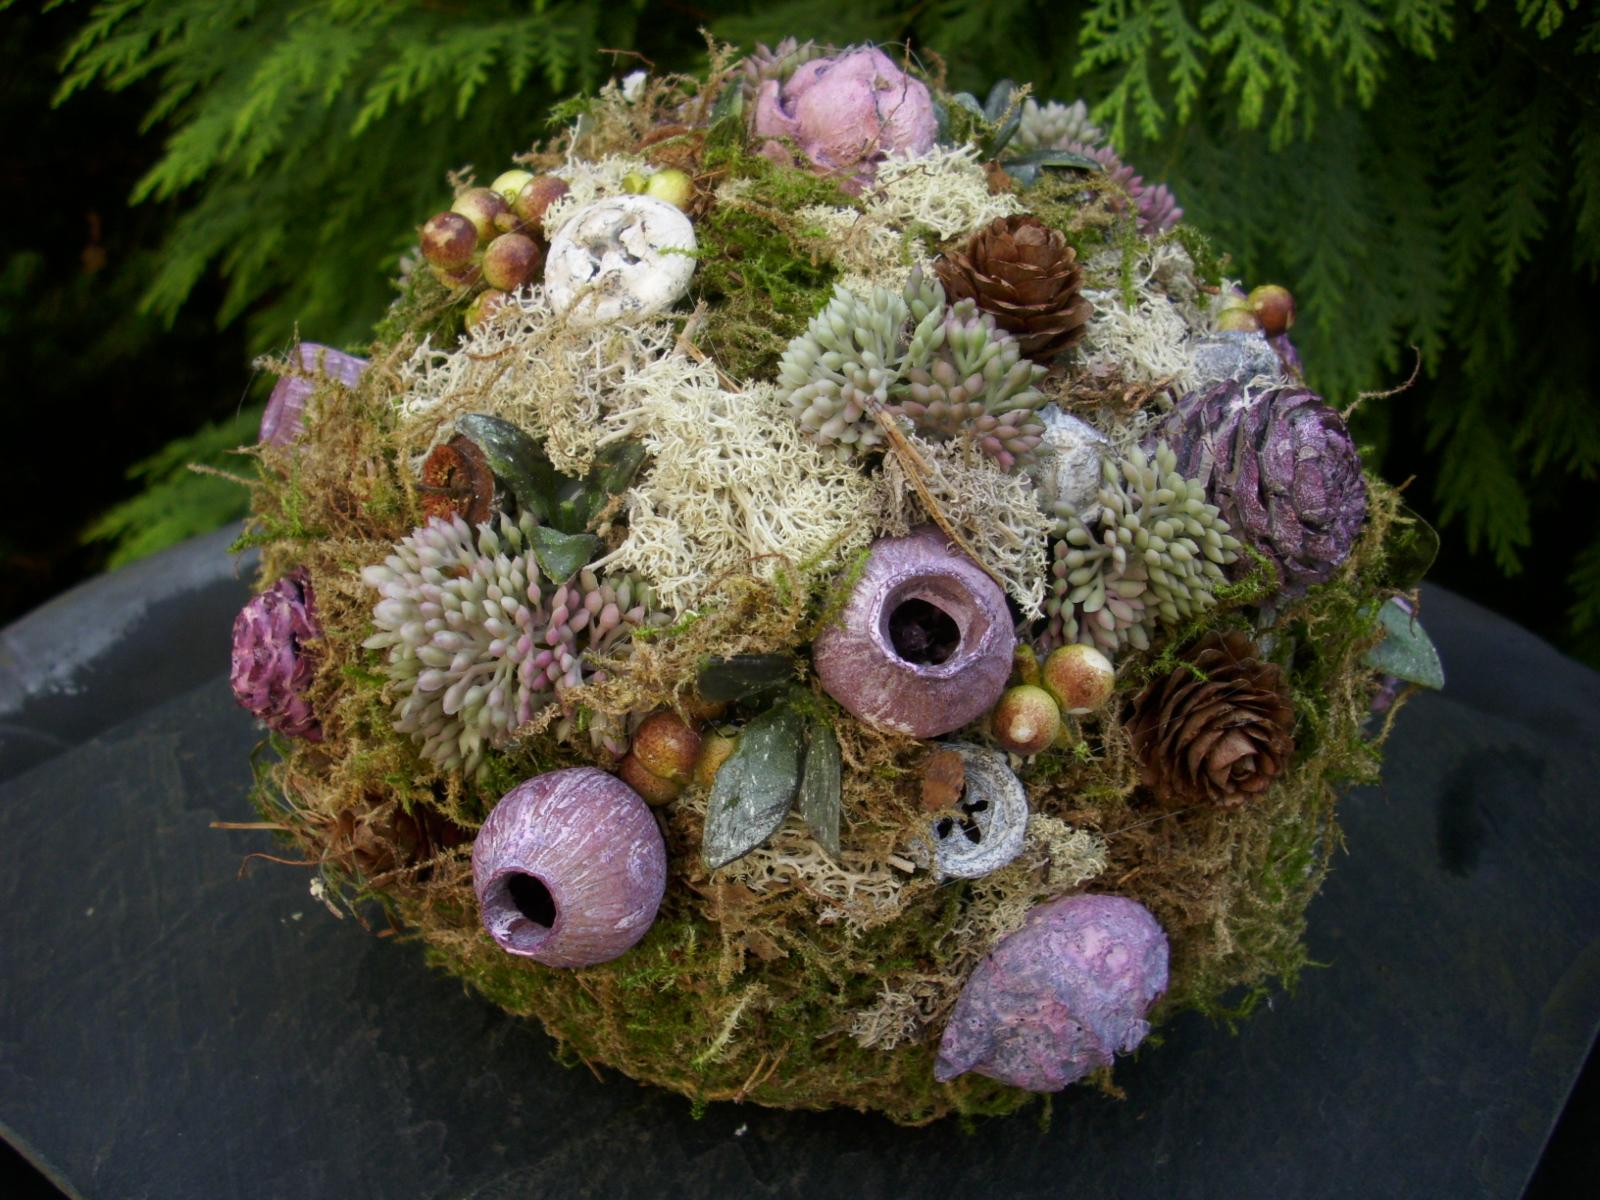 grabschmuck blumenkugel lila grab gesteck kugel exote waldfriedhof allerheiligen ebay. Black Bedroom Furniture Sets. Home Design Ideas